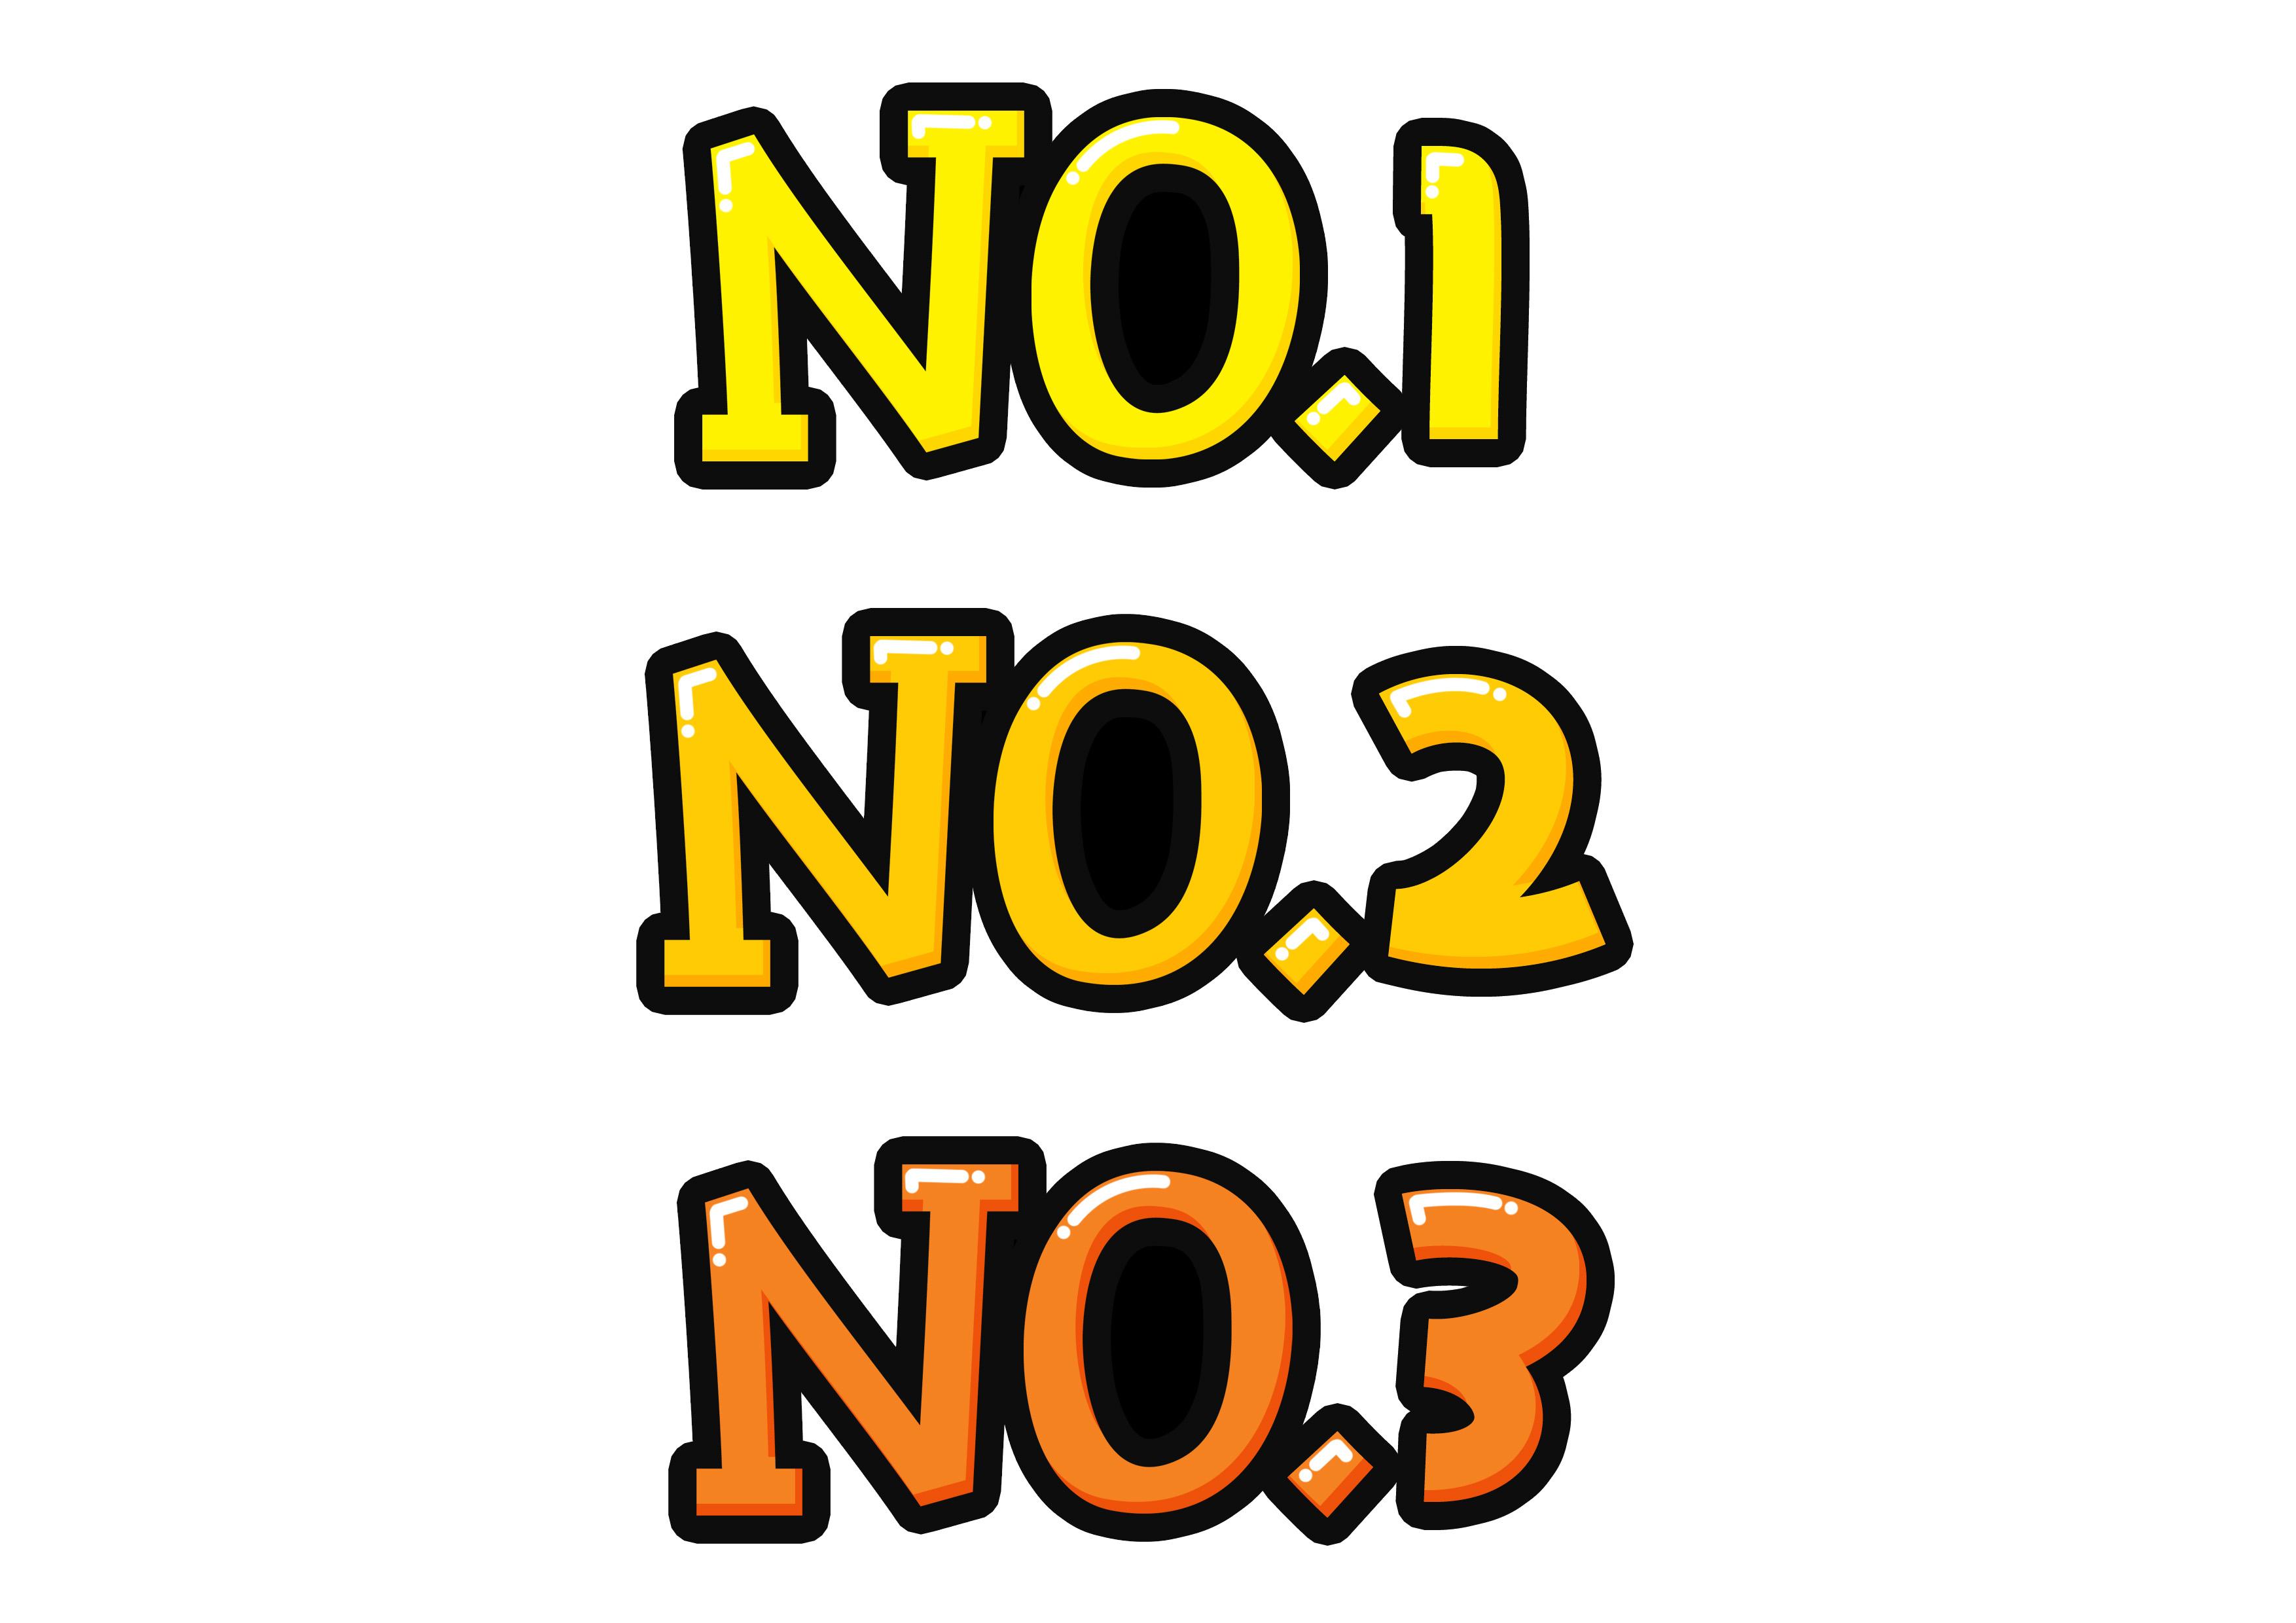 NO.1, NO.2, NO.3